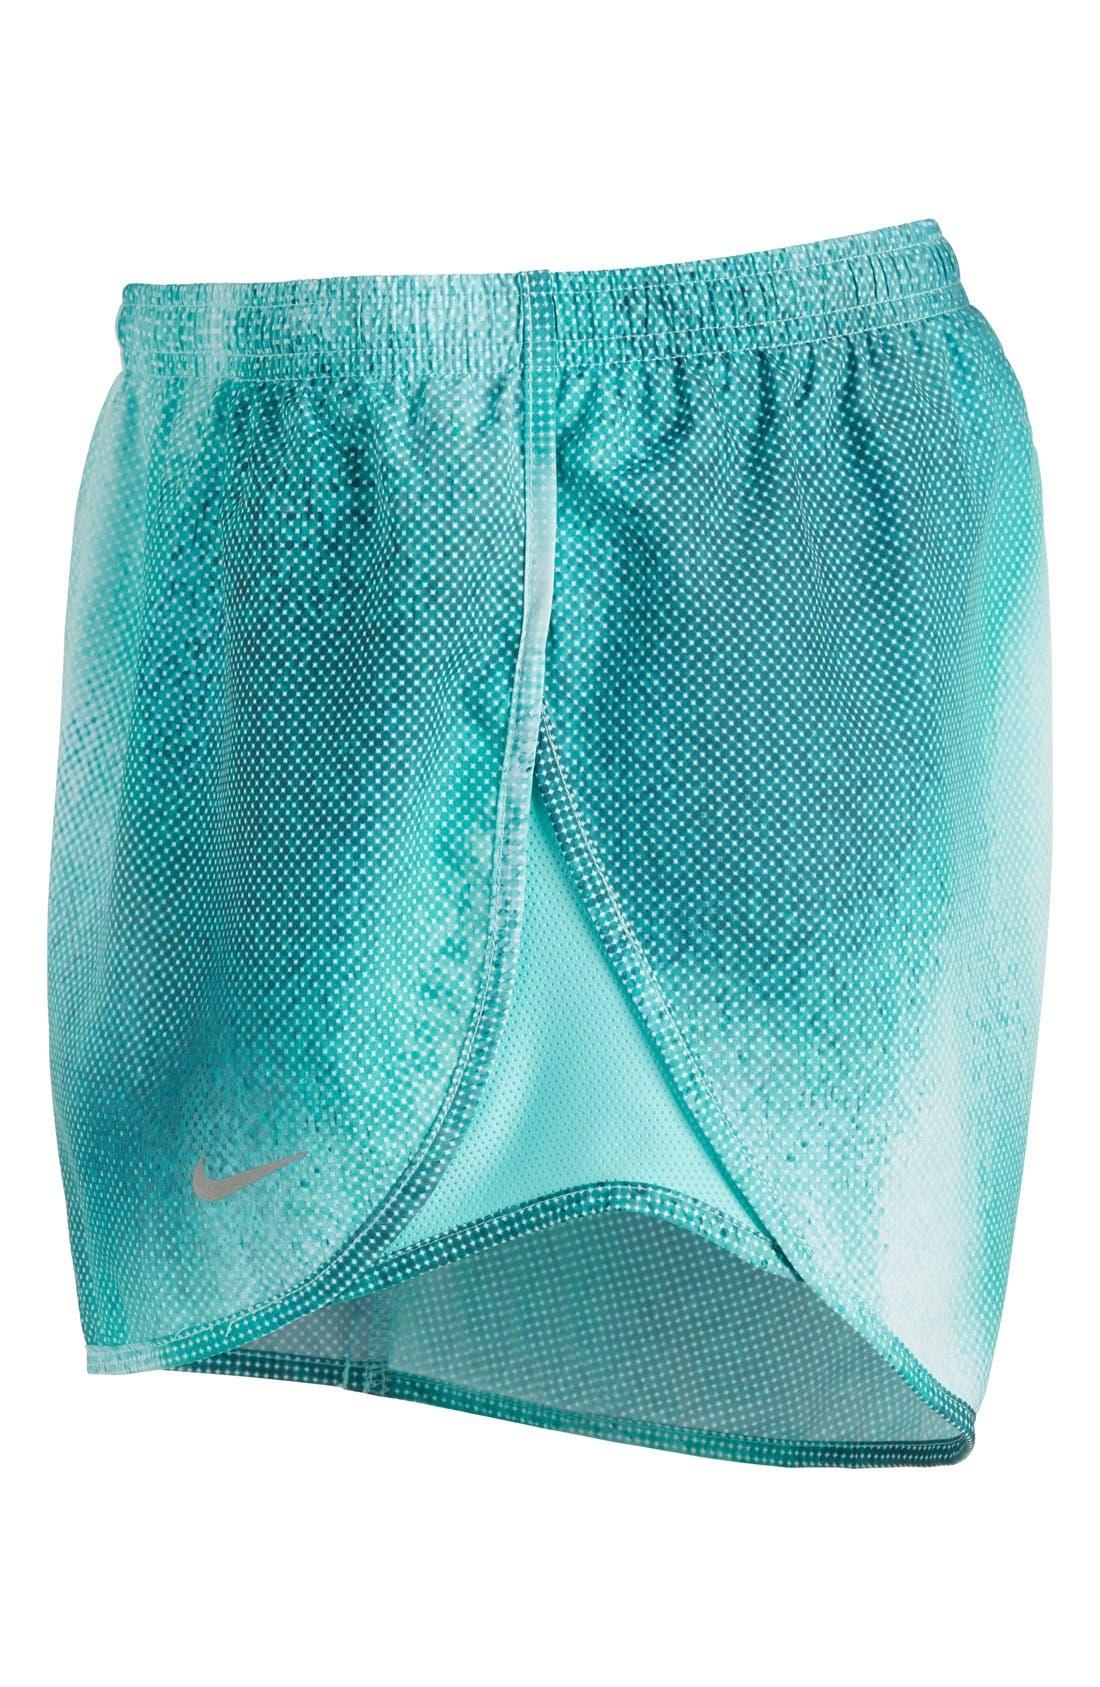 Alternate Image 3  - Nike 'Modern Tempo' Print Dri-FIT Shorts (Women)